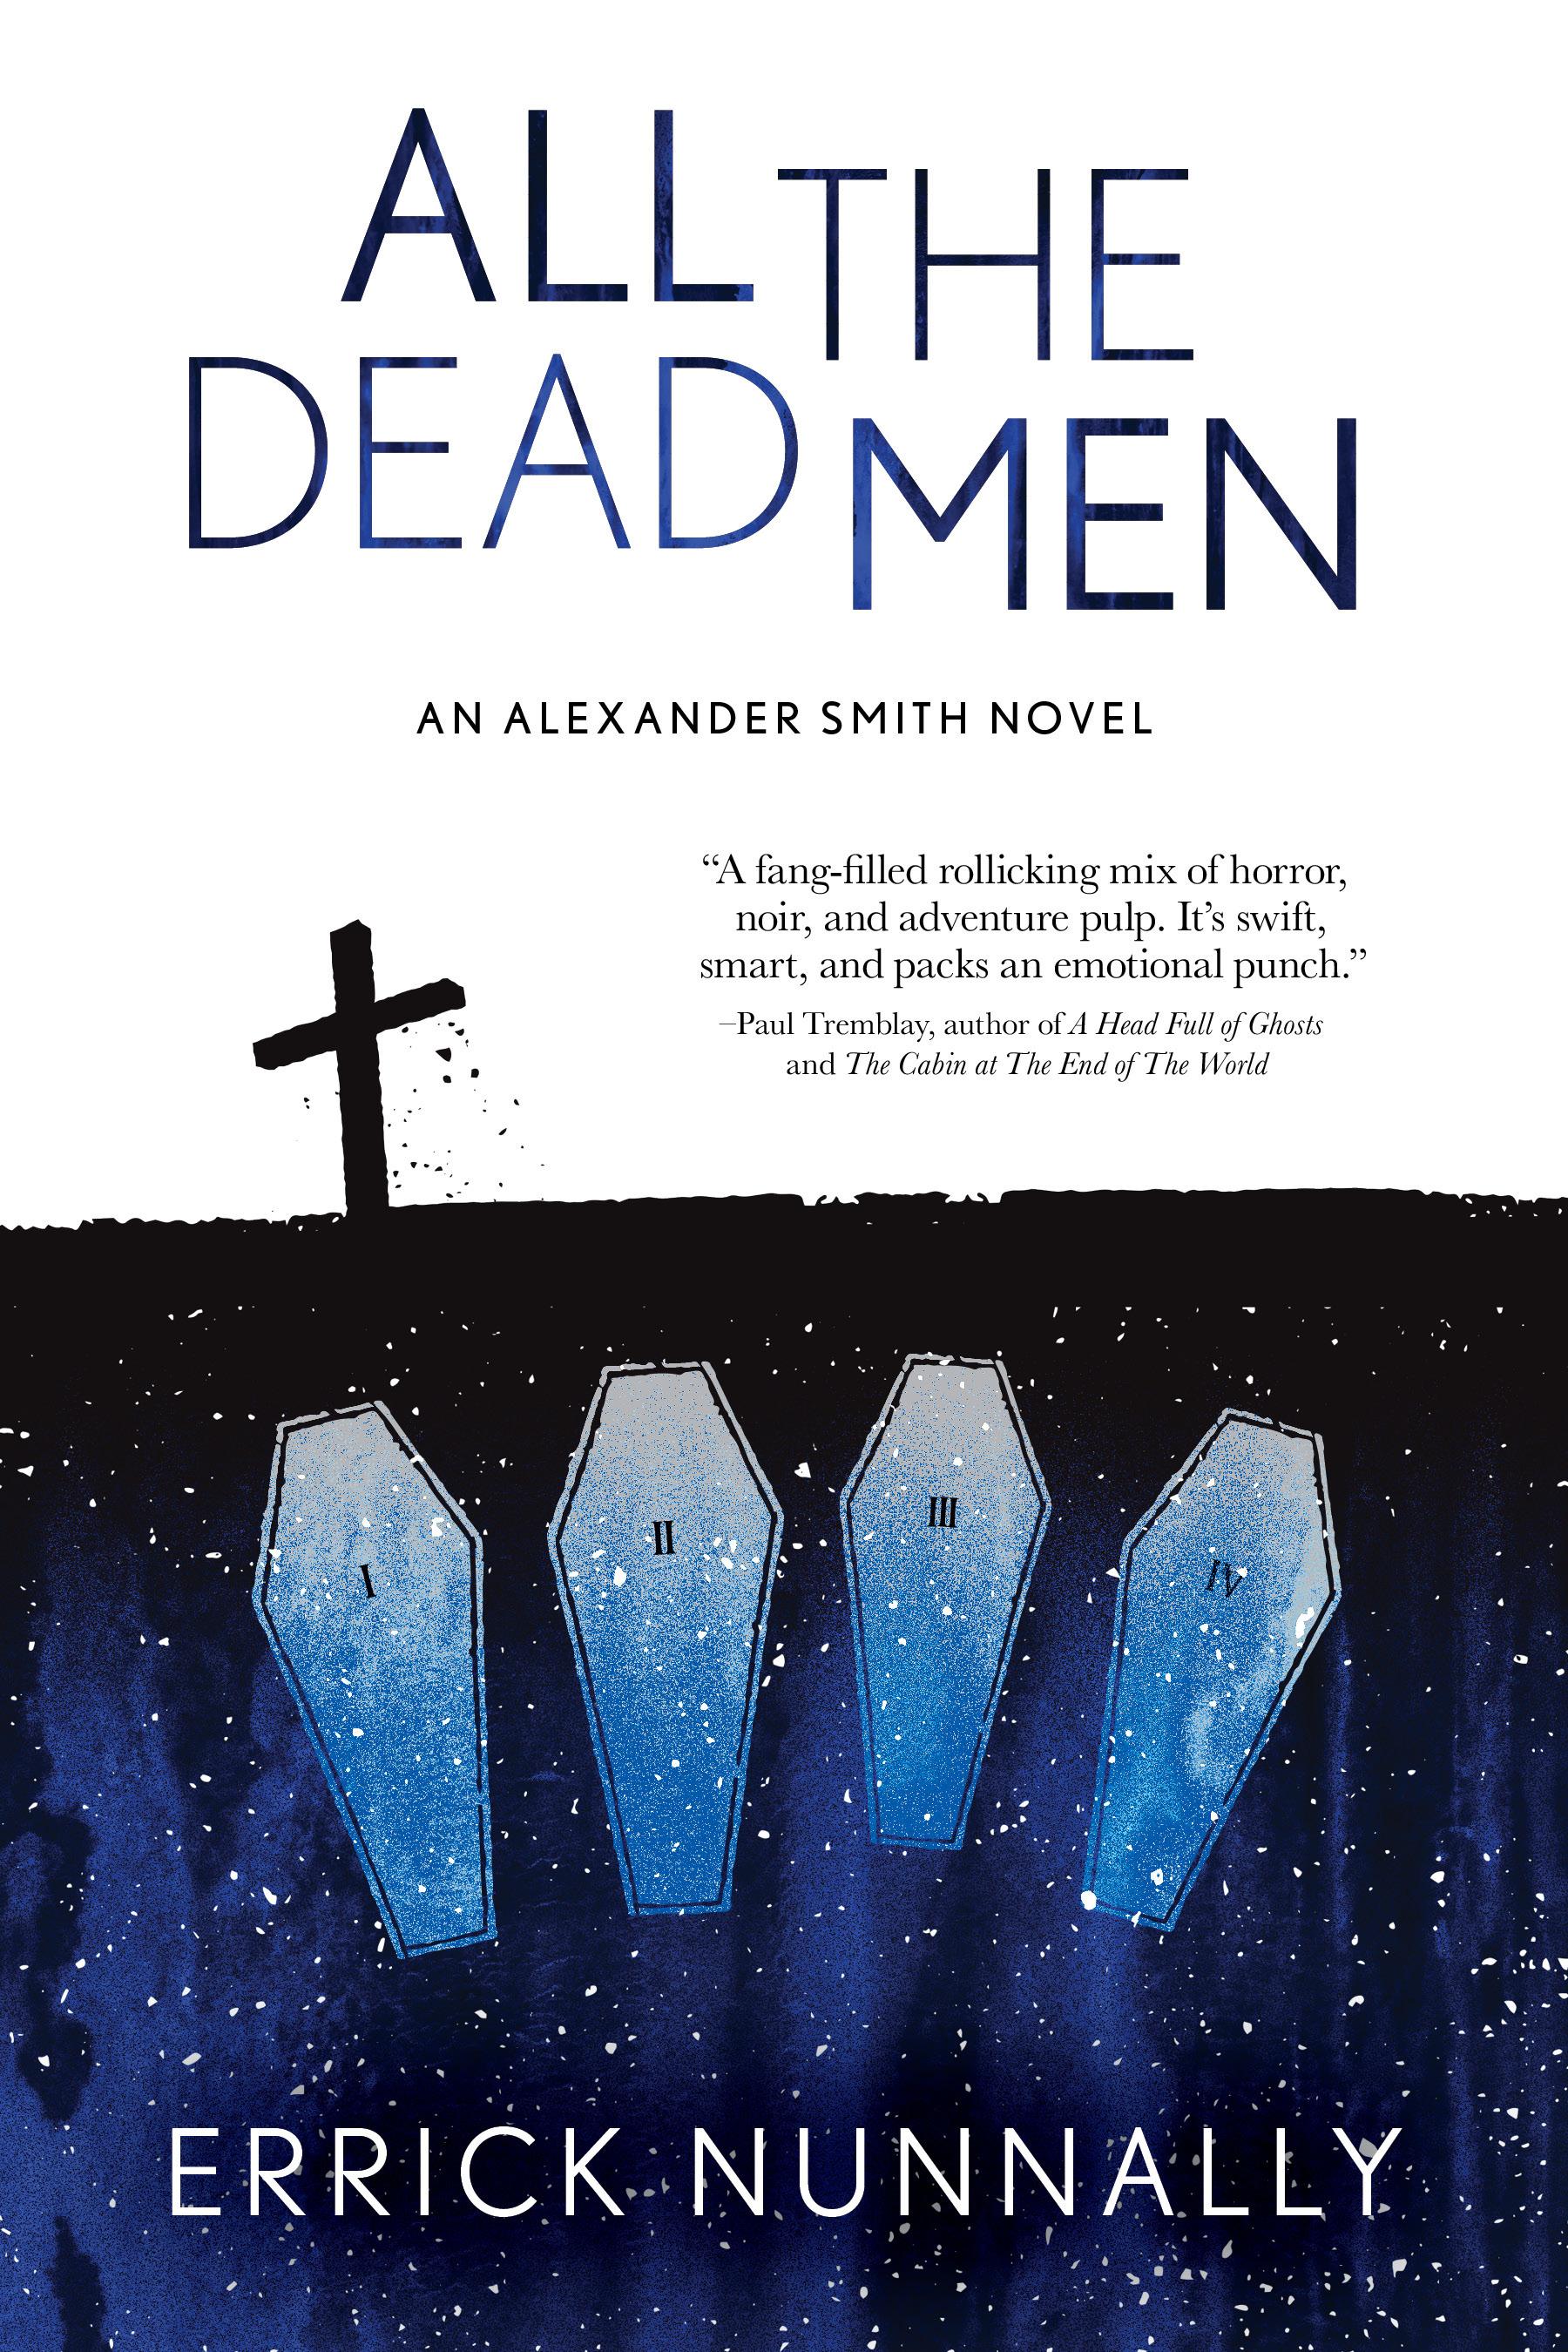 All The Dead Men